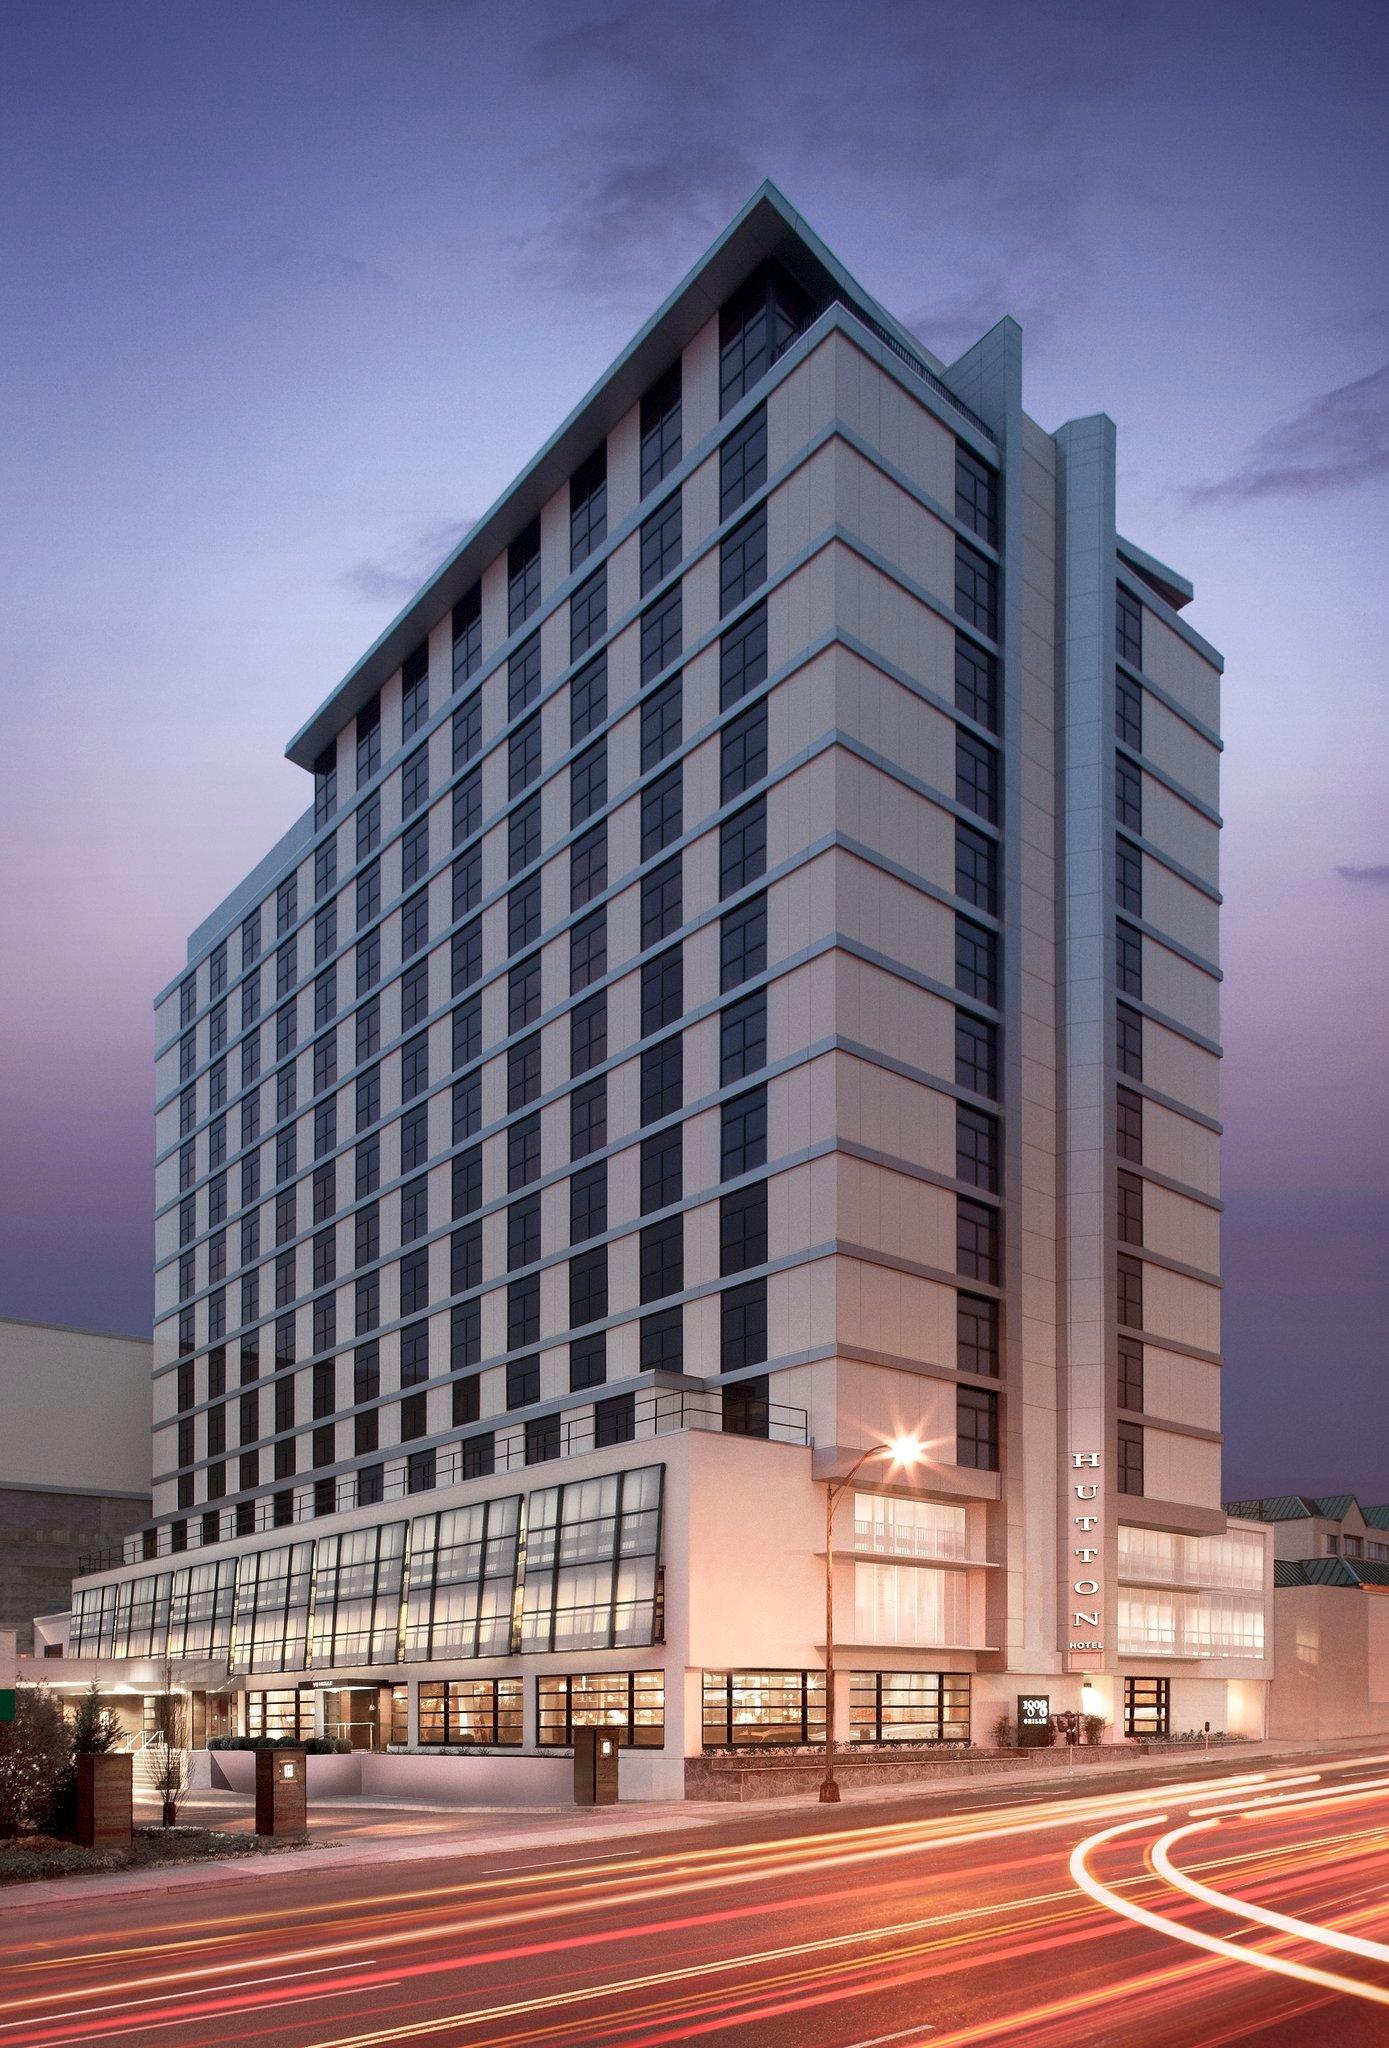 Nashville Hotels With 2 Bedroom Suites Hutton Hotel Updated 2017 Reviews Price Comparison Nashville